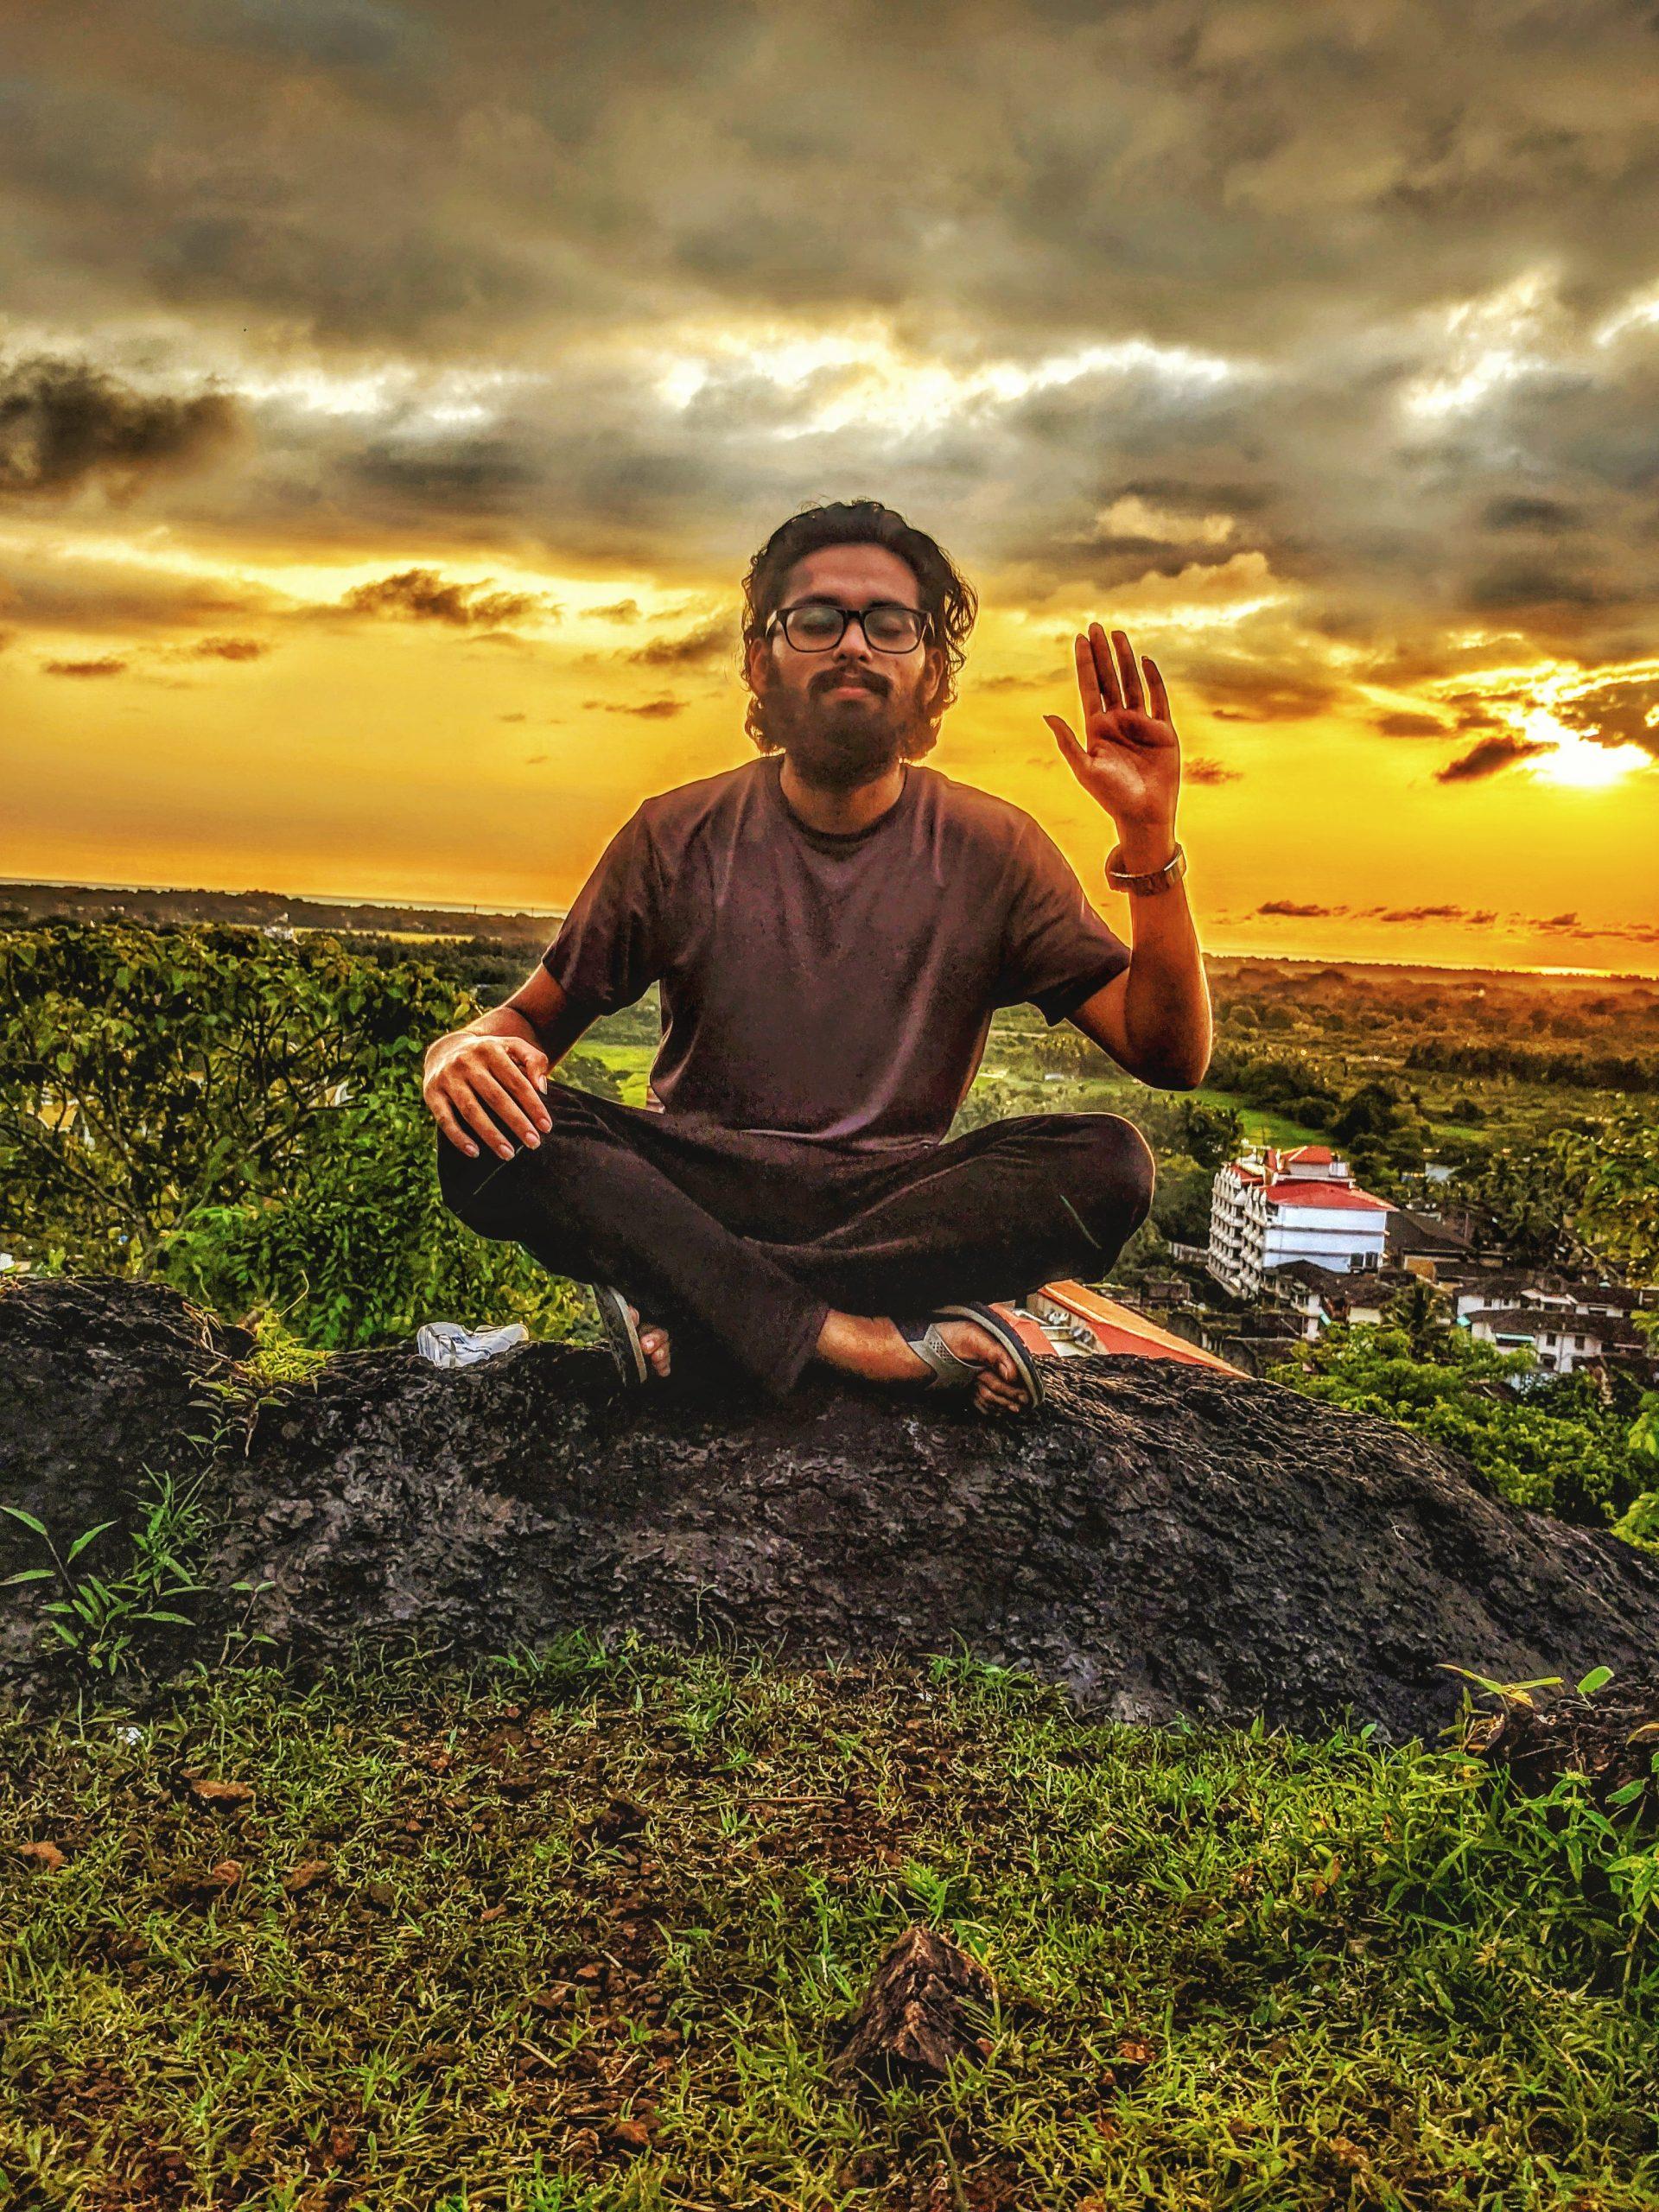 A man in meditation posture